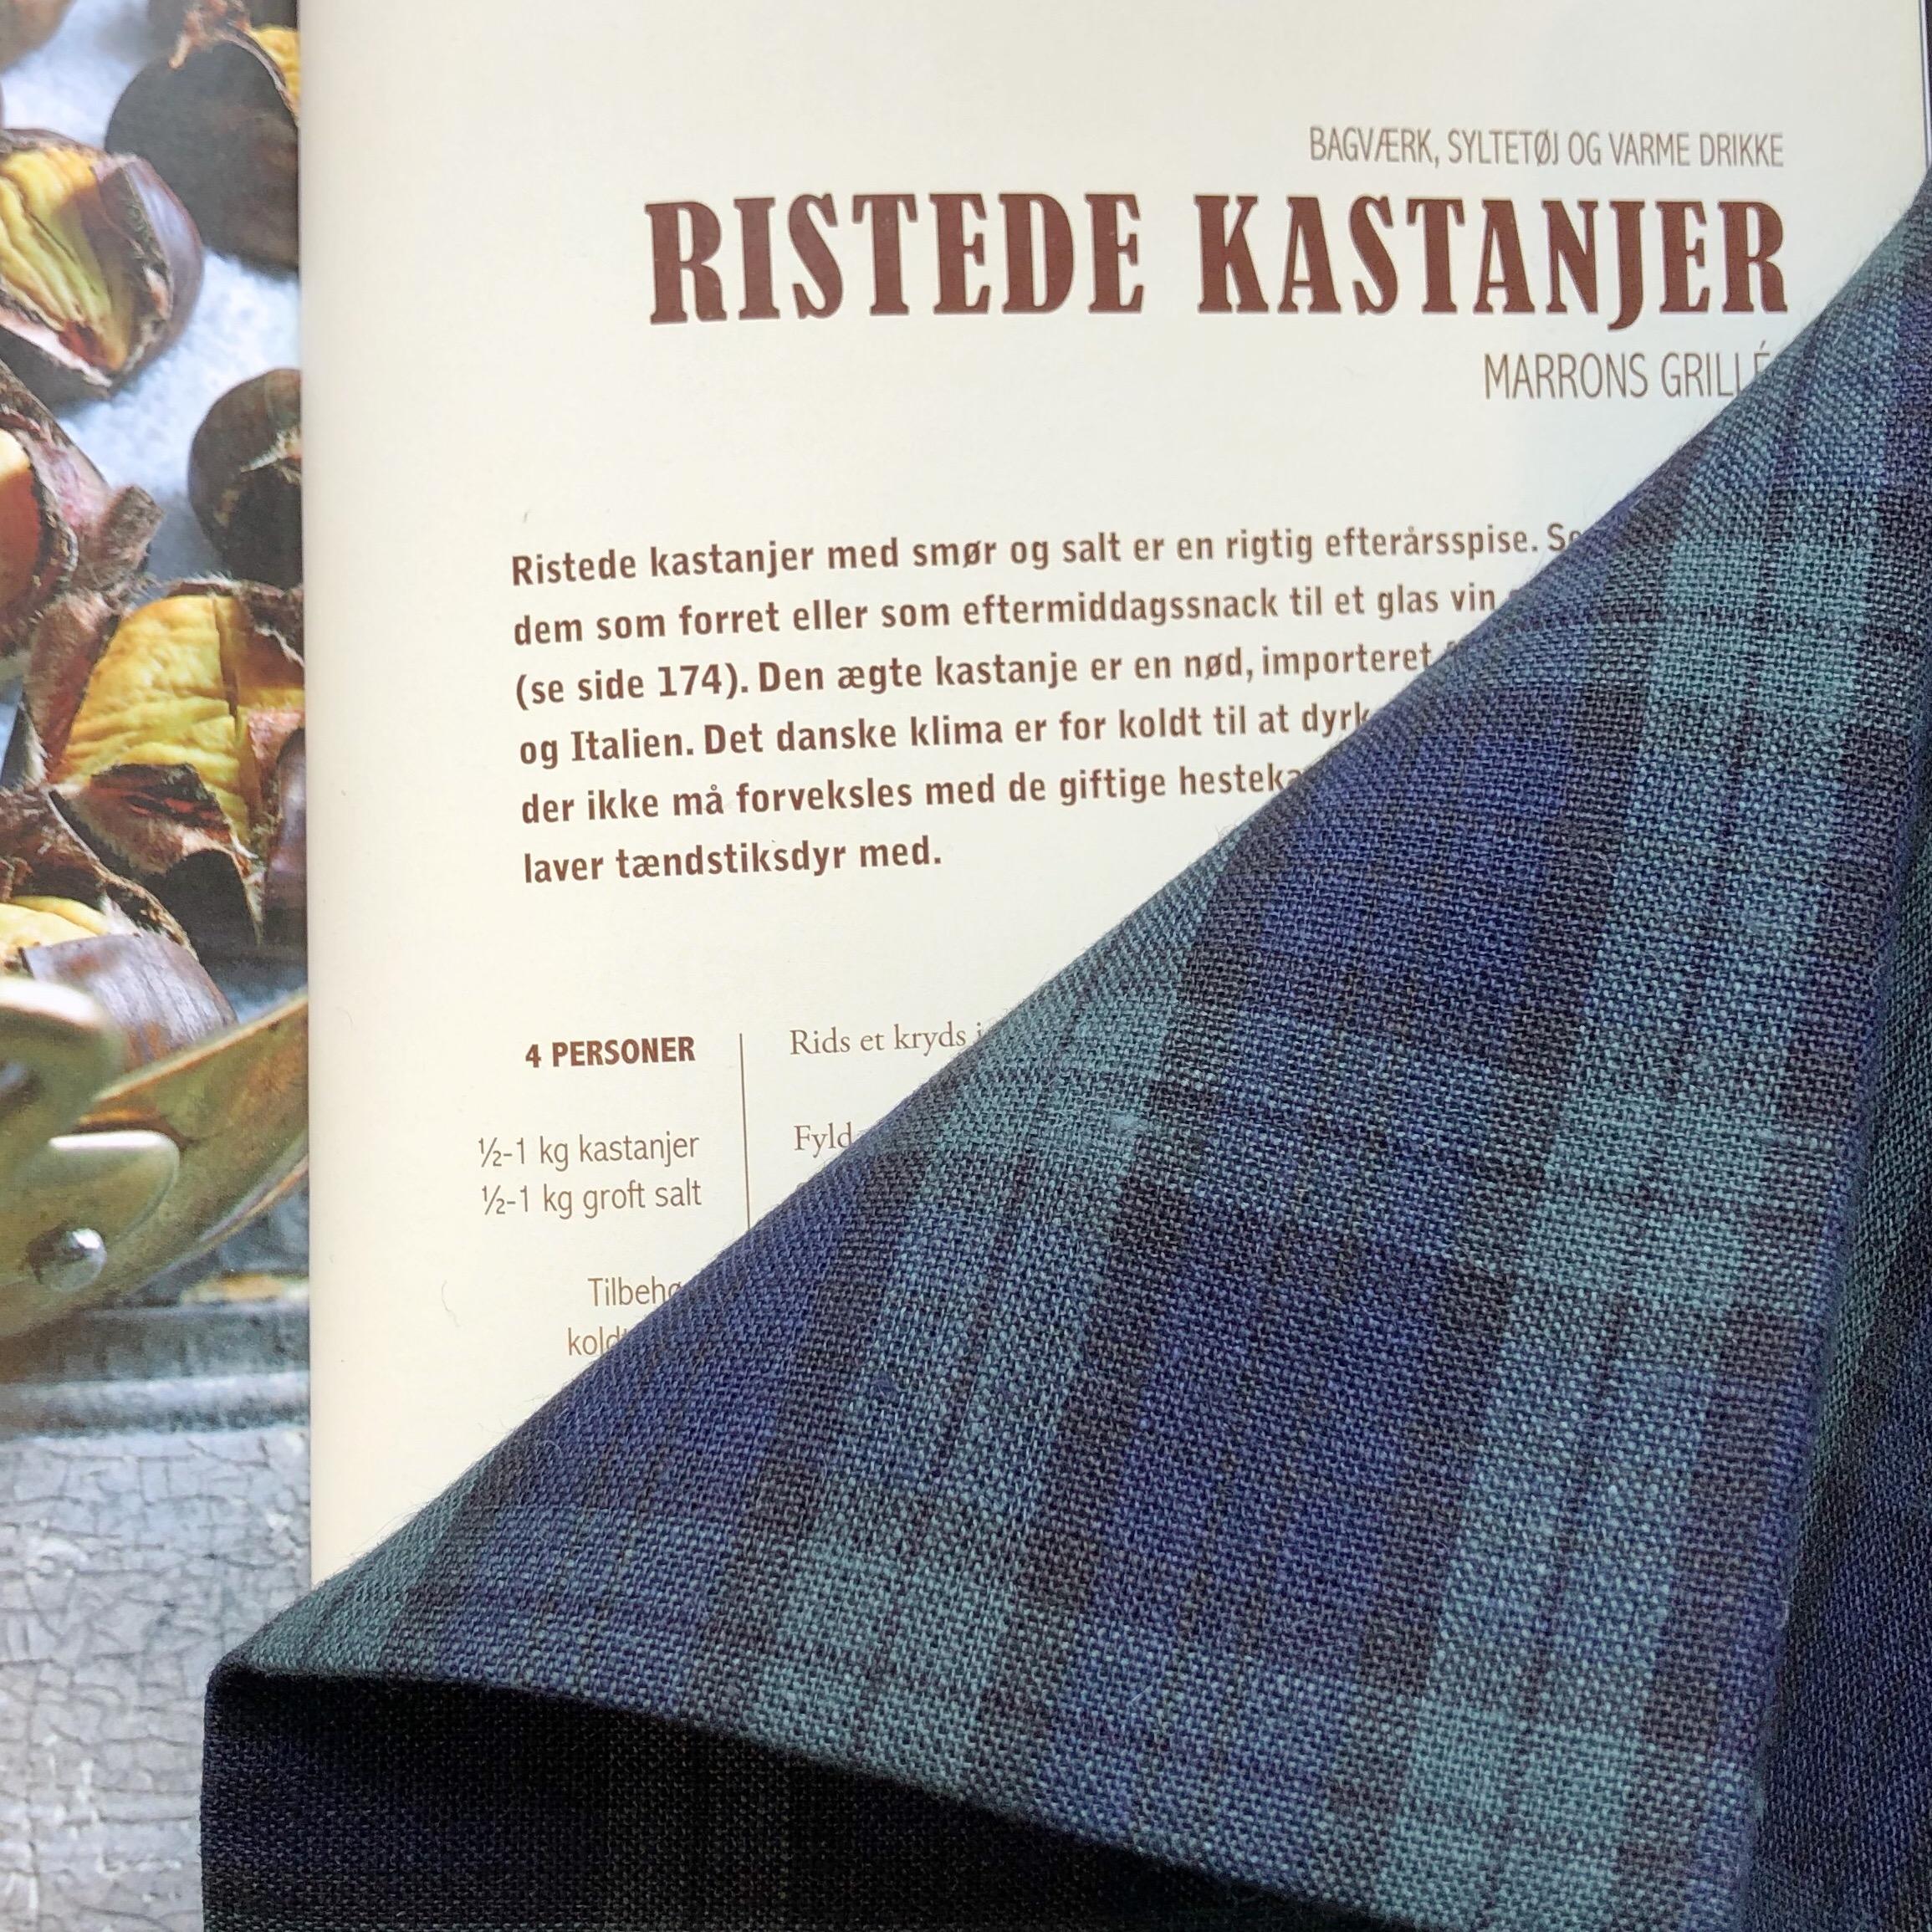 Fog Linen Work / Viskestykke (Green and Navy Tartan Check)